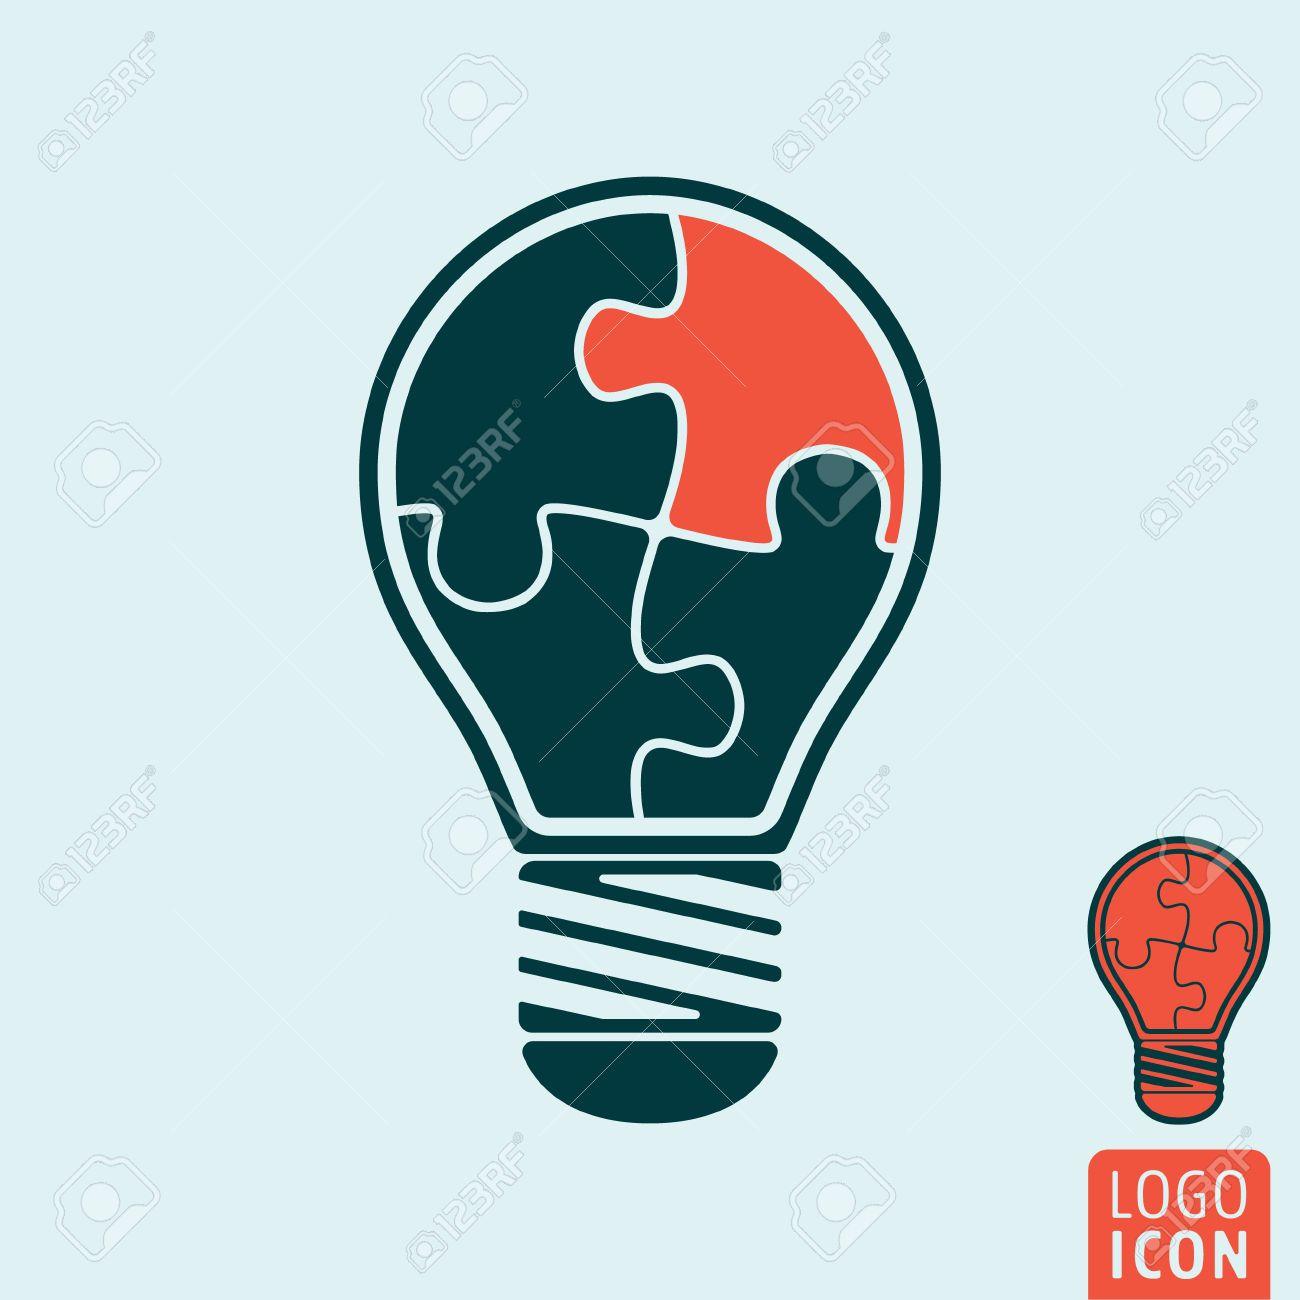 Light Bulb Icon Light Bulb Symbol Light Bulb With Jigsaw Puzzle